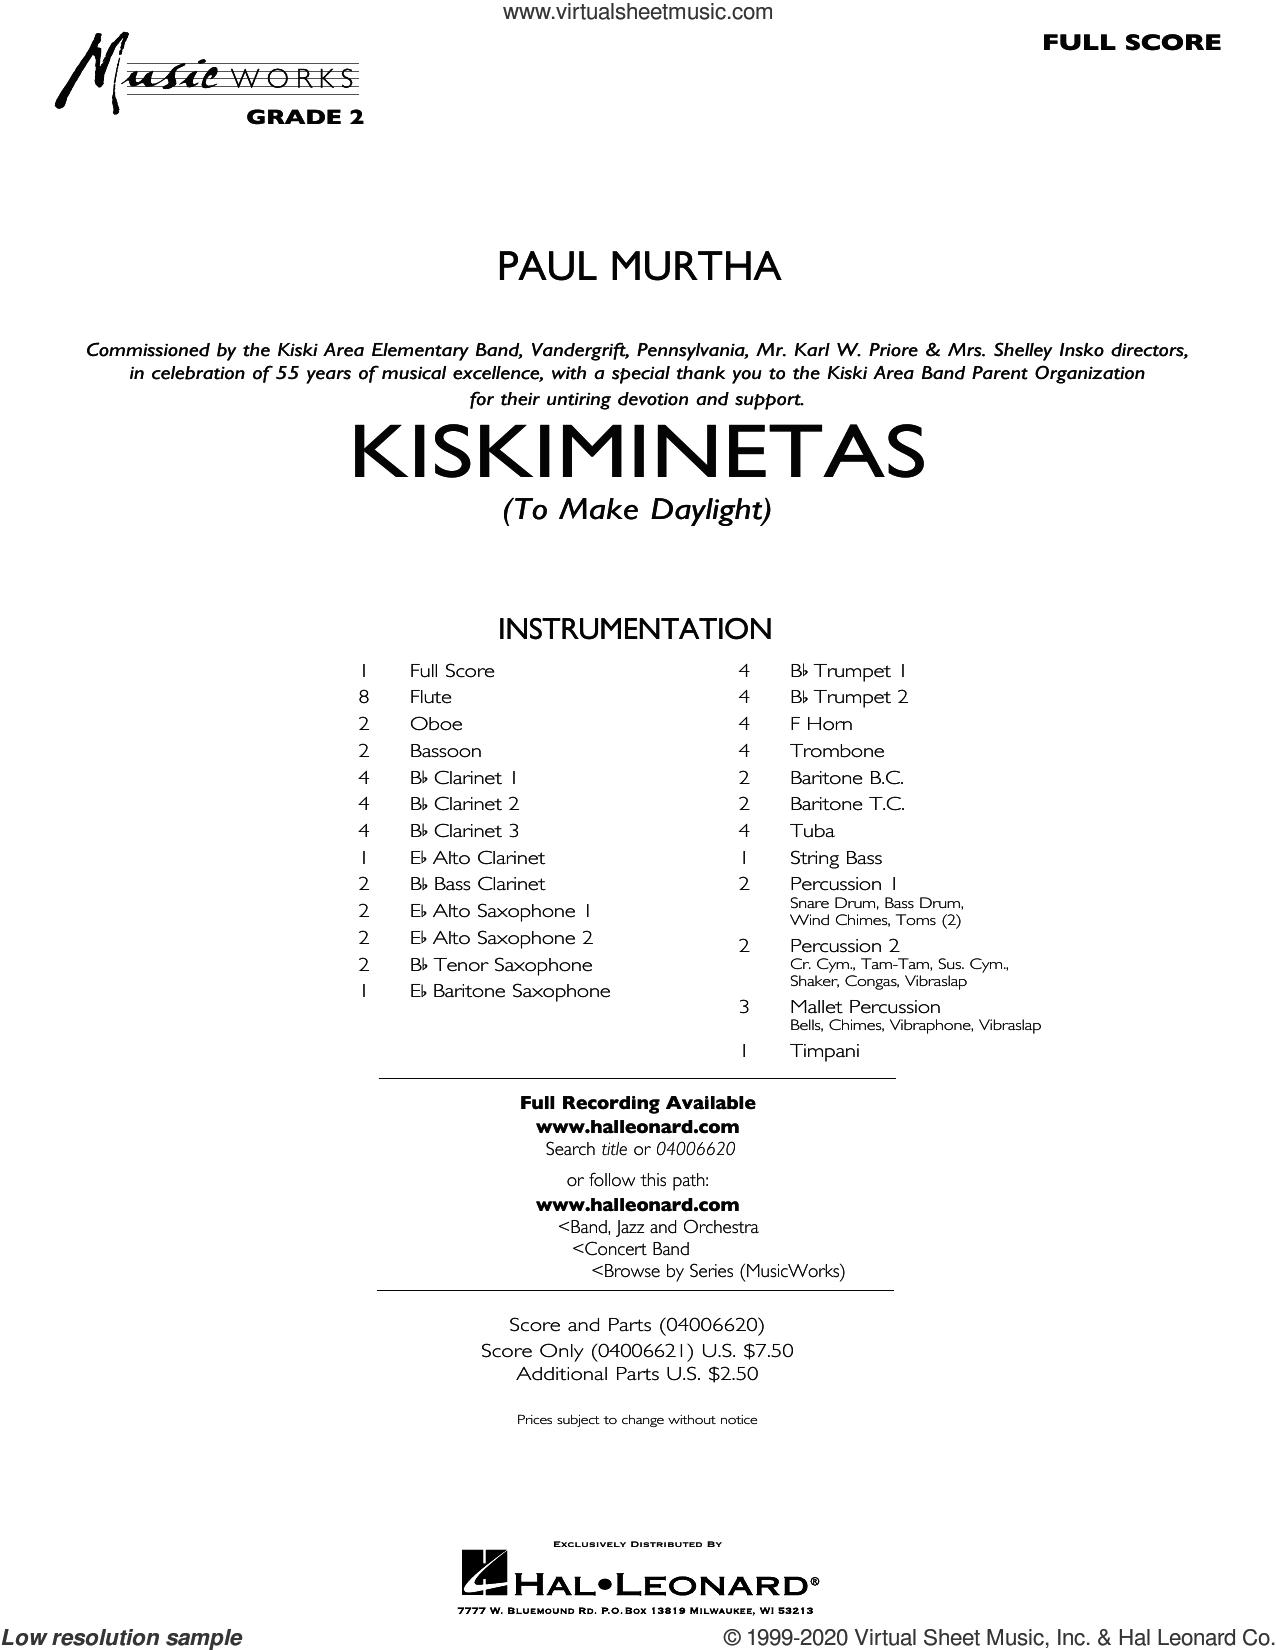 Kiskiminetas (To Make Daylight) (COMPLETE) sheet music for concert band by Paul Murtha, intermediate skill level